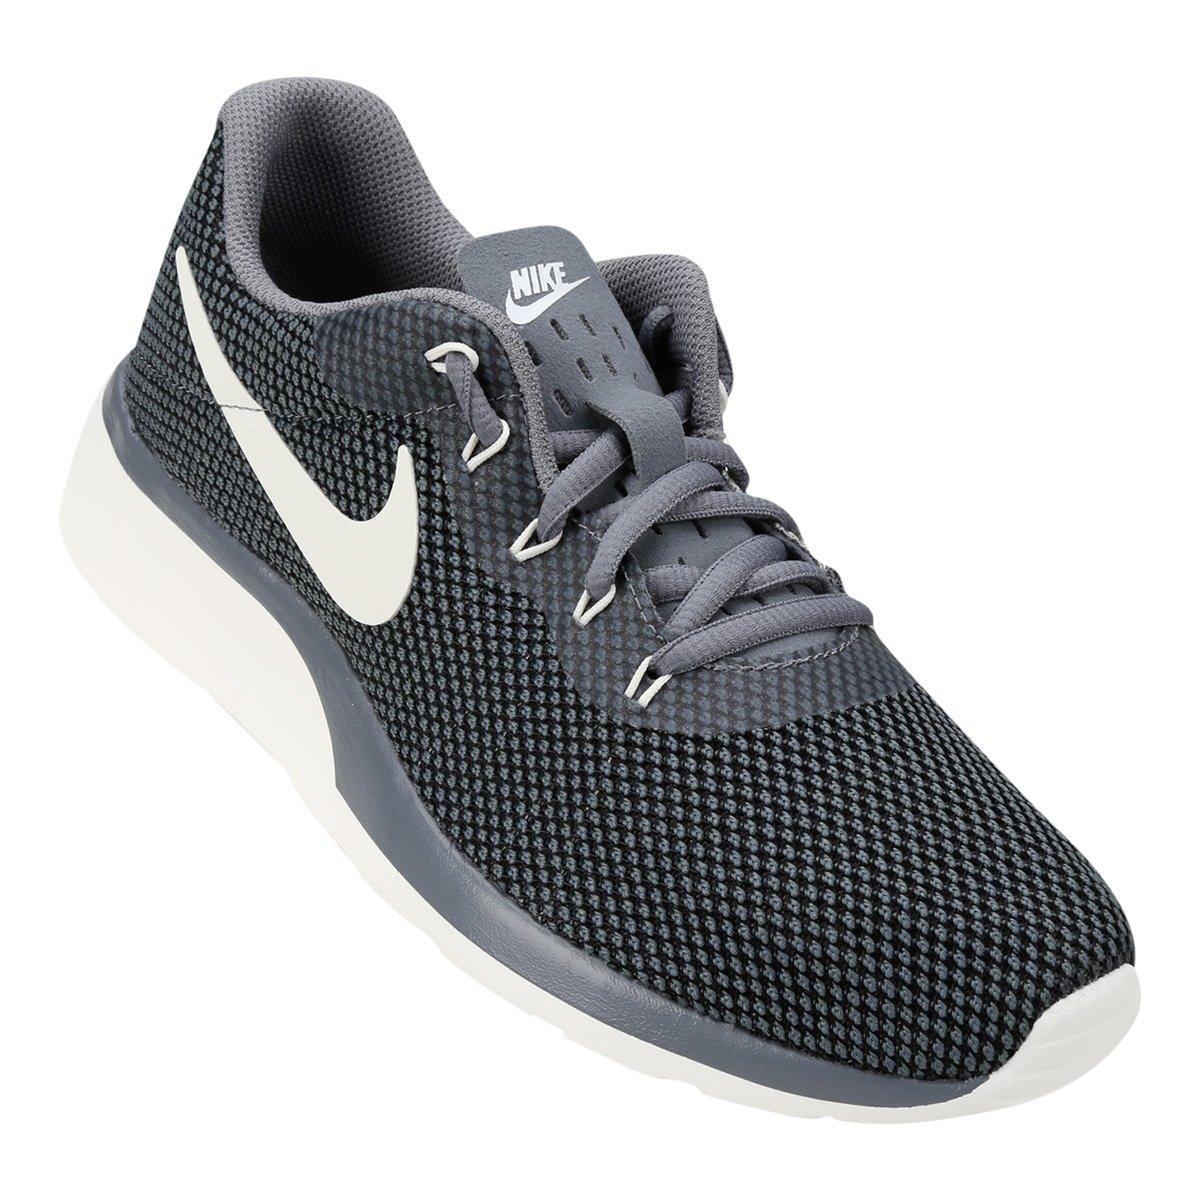 cc4003b3421 Tênis Nike Tanjun Racer Feminino - Compre Agora